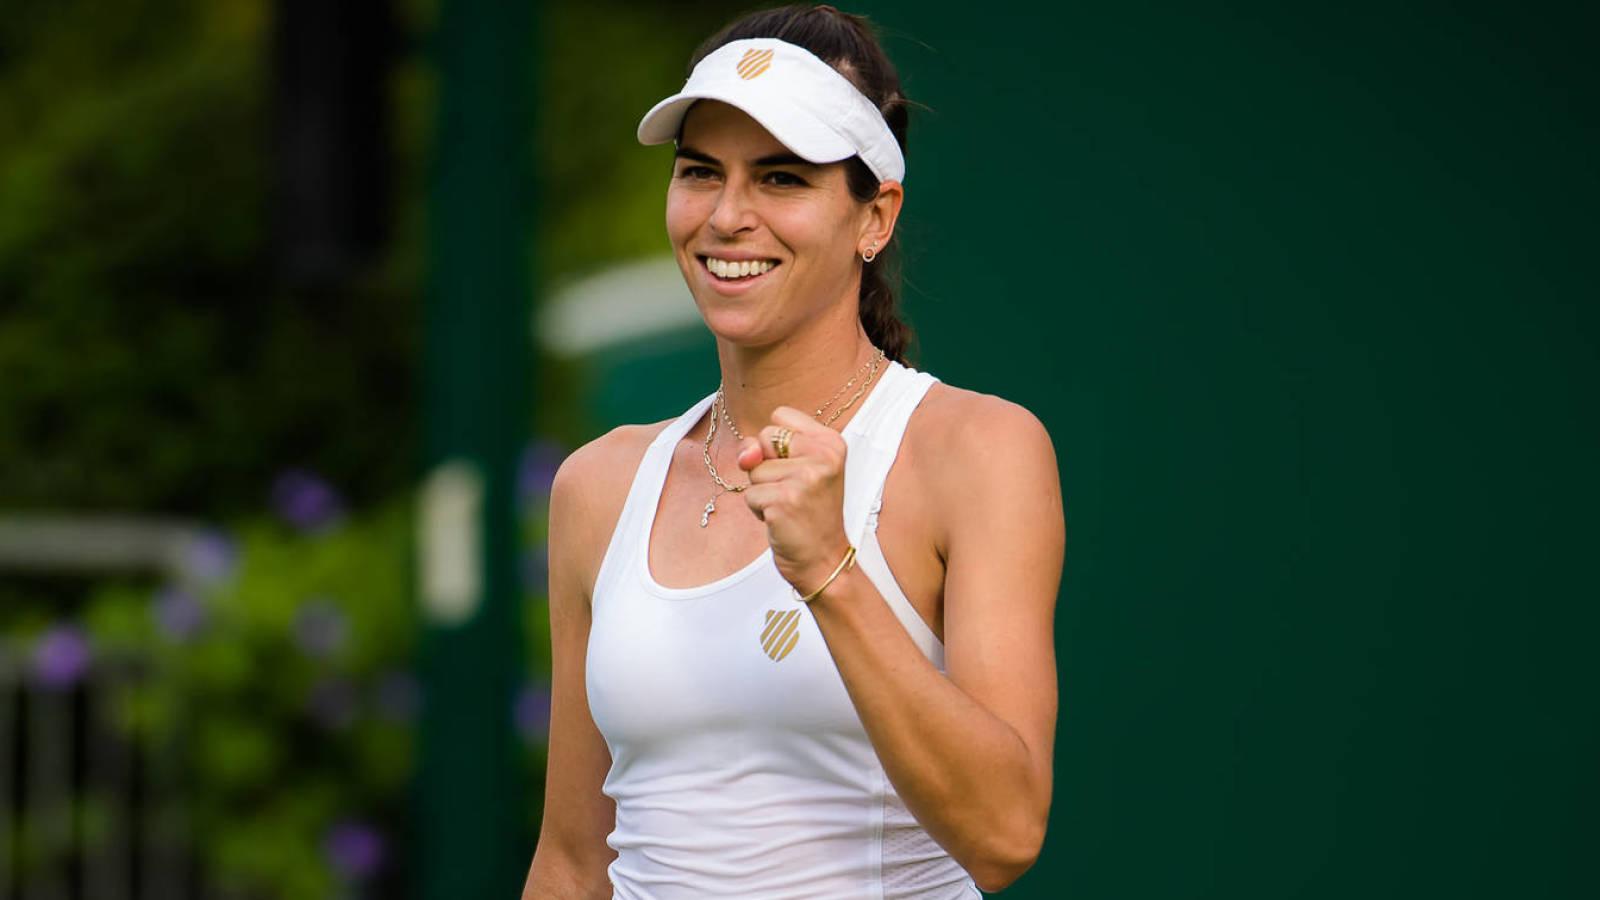 Ajla Tomljanovic and Jelena Ostapenko enter the game at Wimbledon